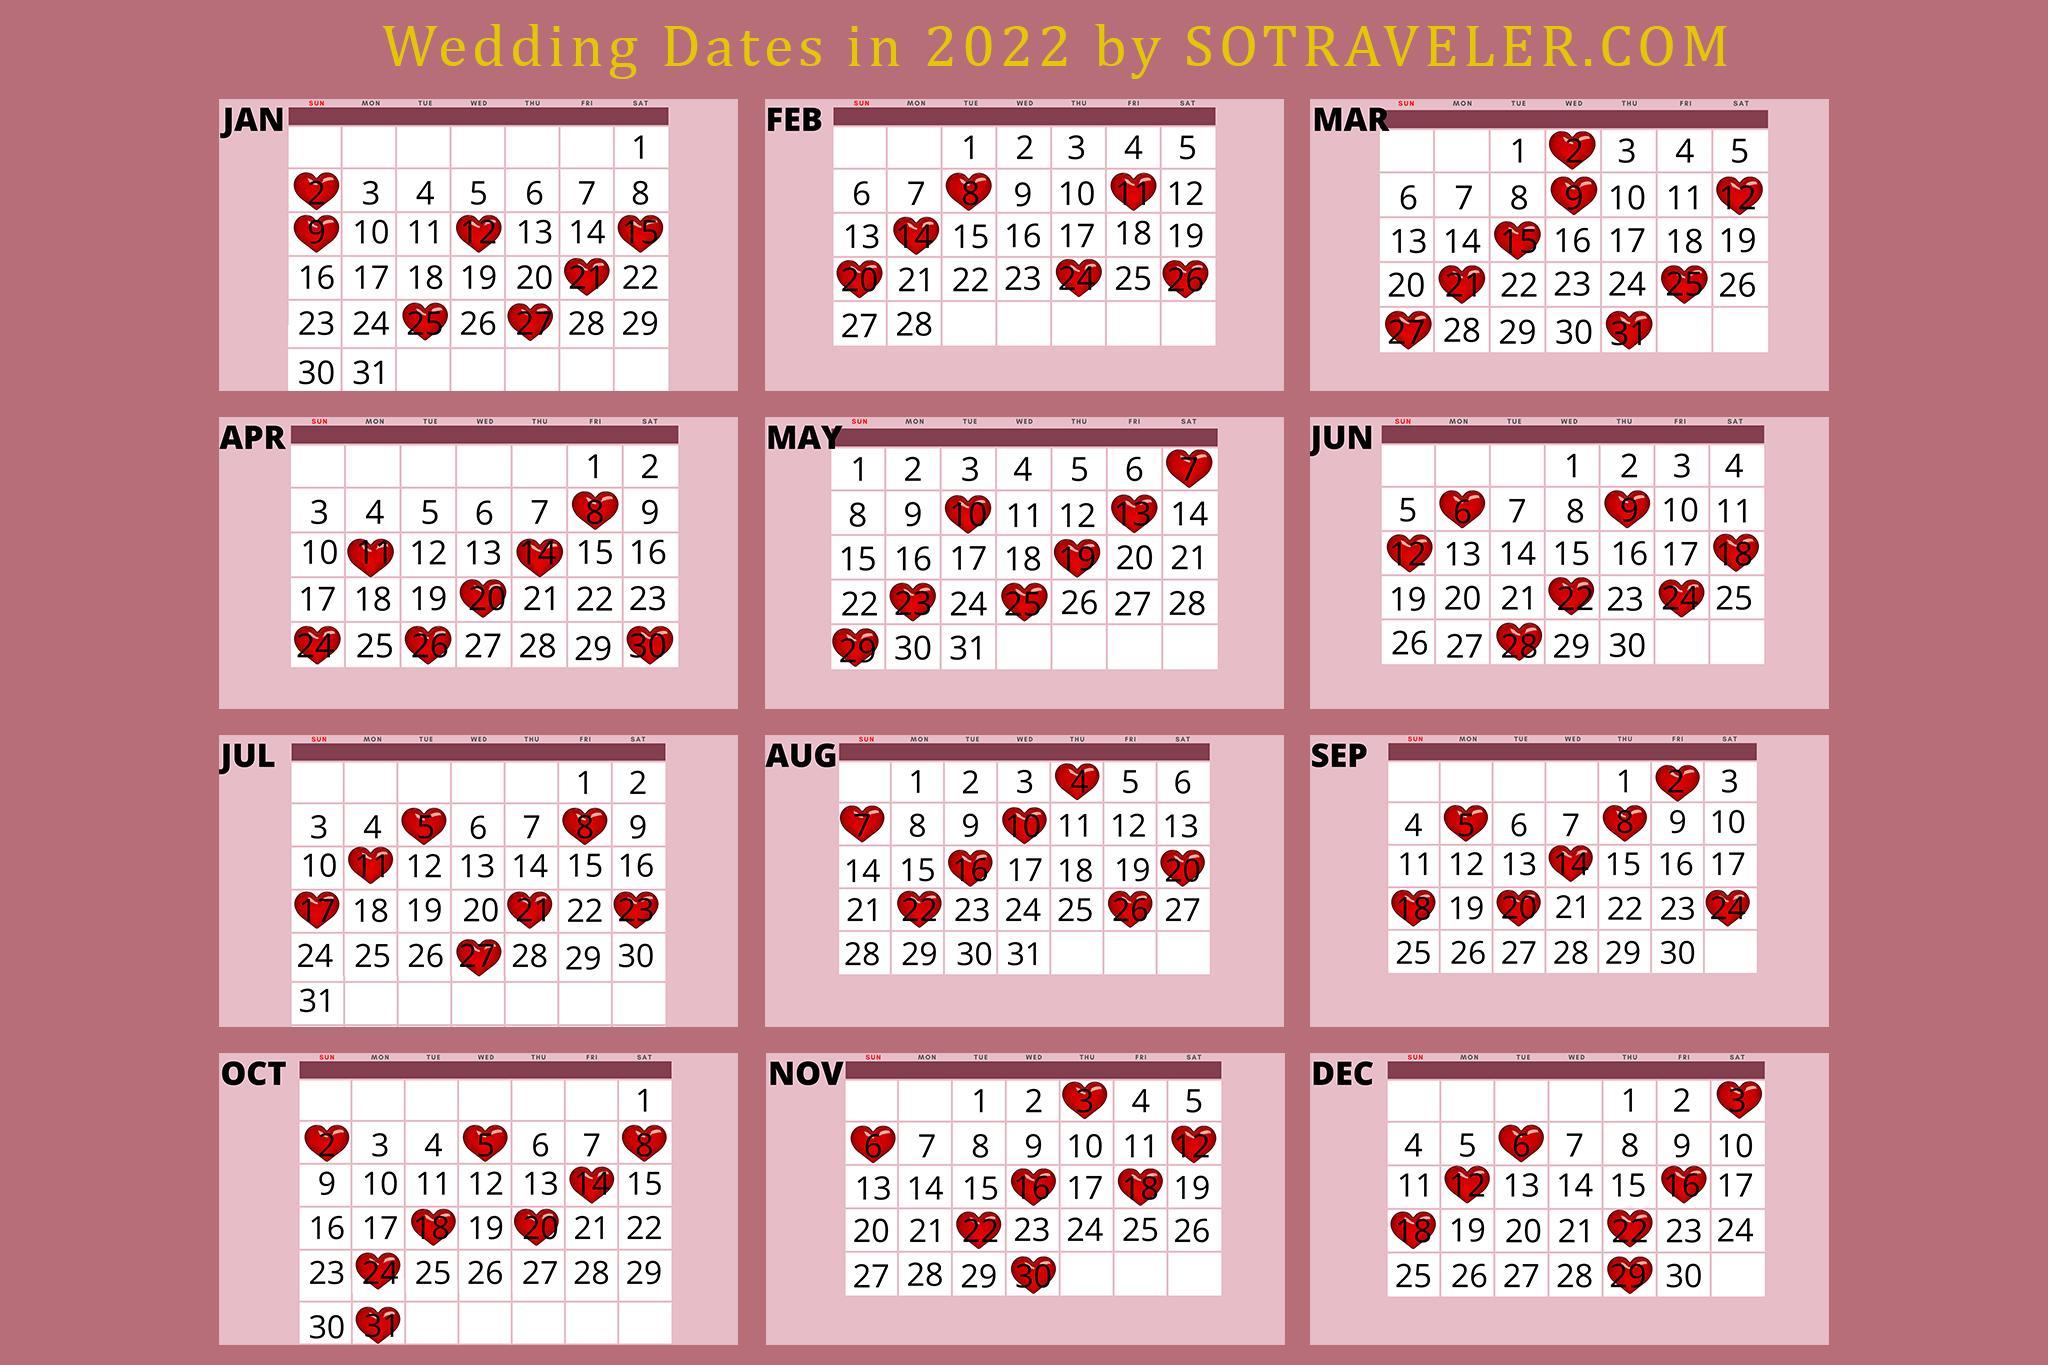 Wedding Dates in 2022